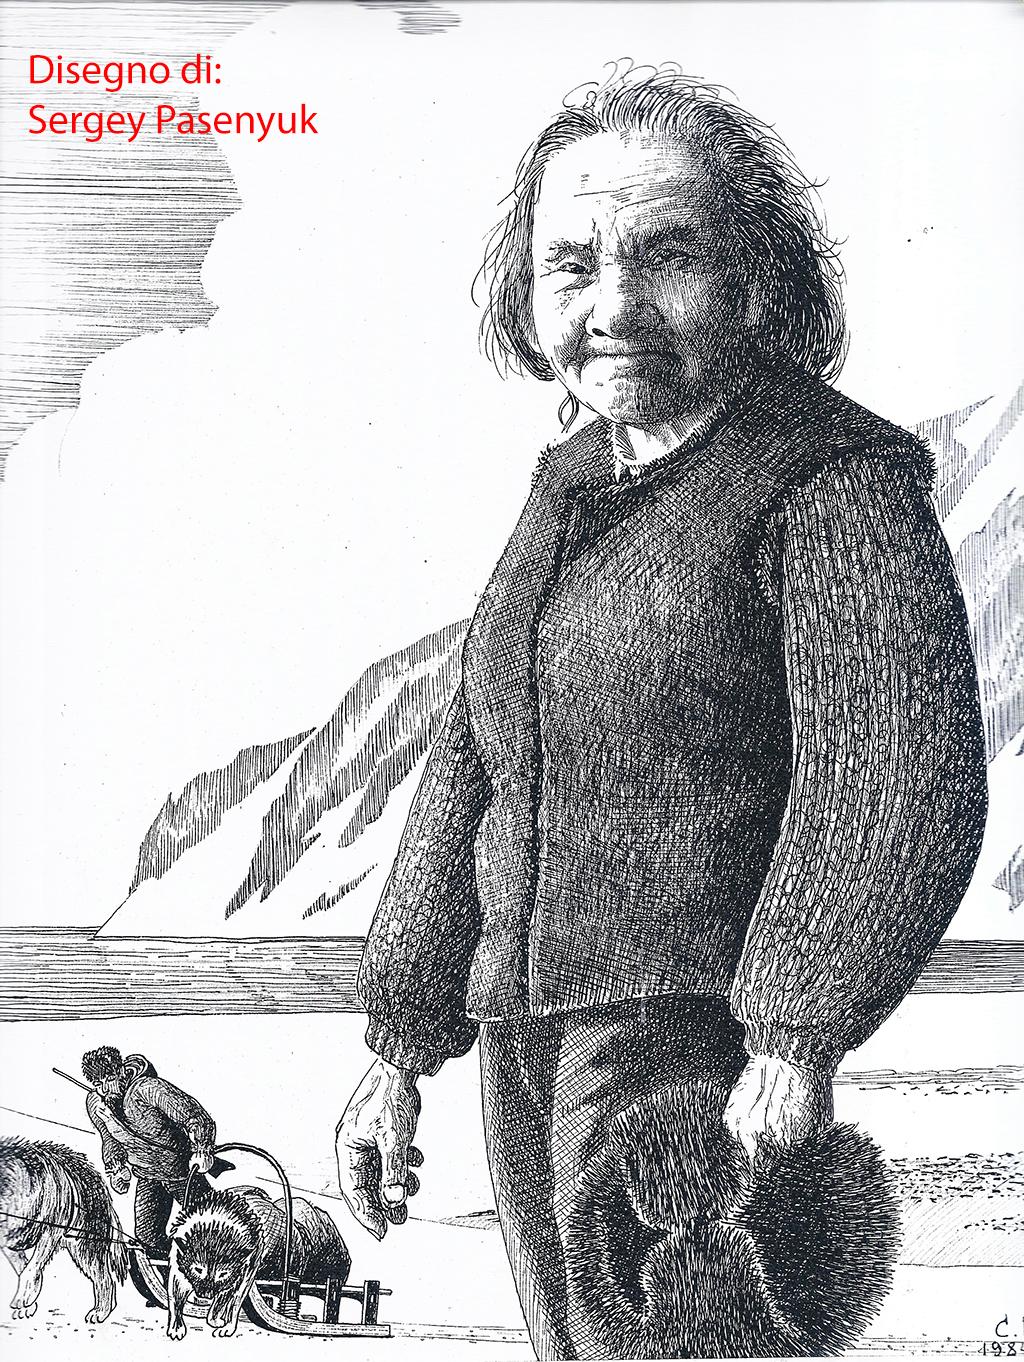 1131 Disegno di Sergey Pasenyuk, artista di Nikolskoye, raffigurante donna Aleut copia